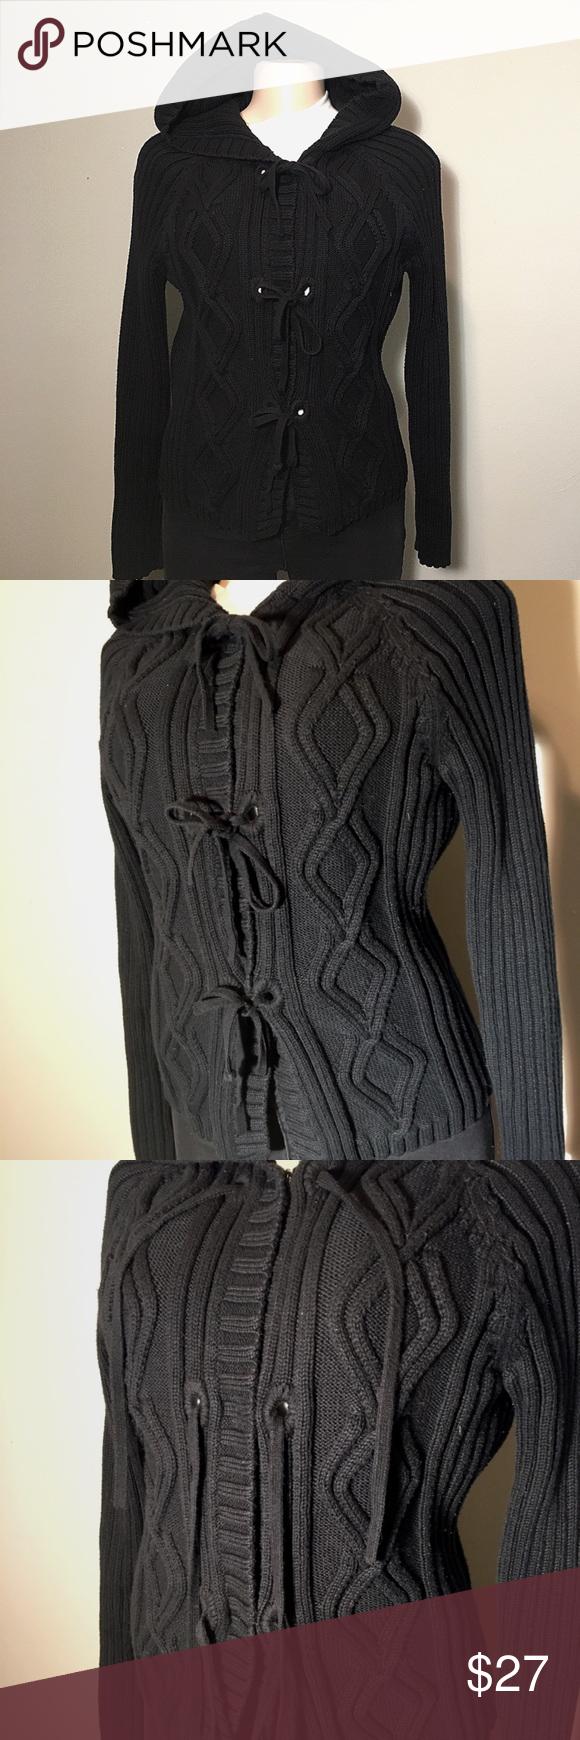 Jones New York Knit Hooded Jacket - B9 | Clothes design ...